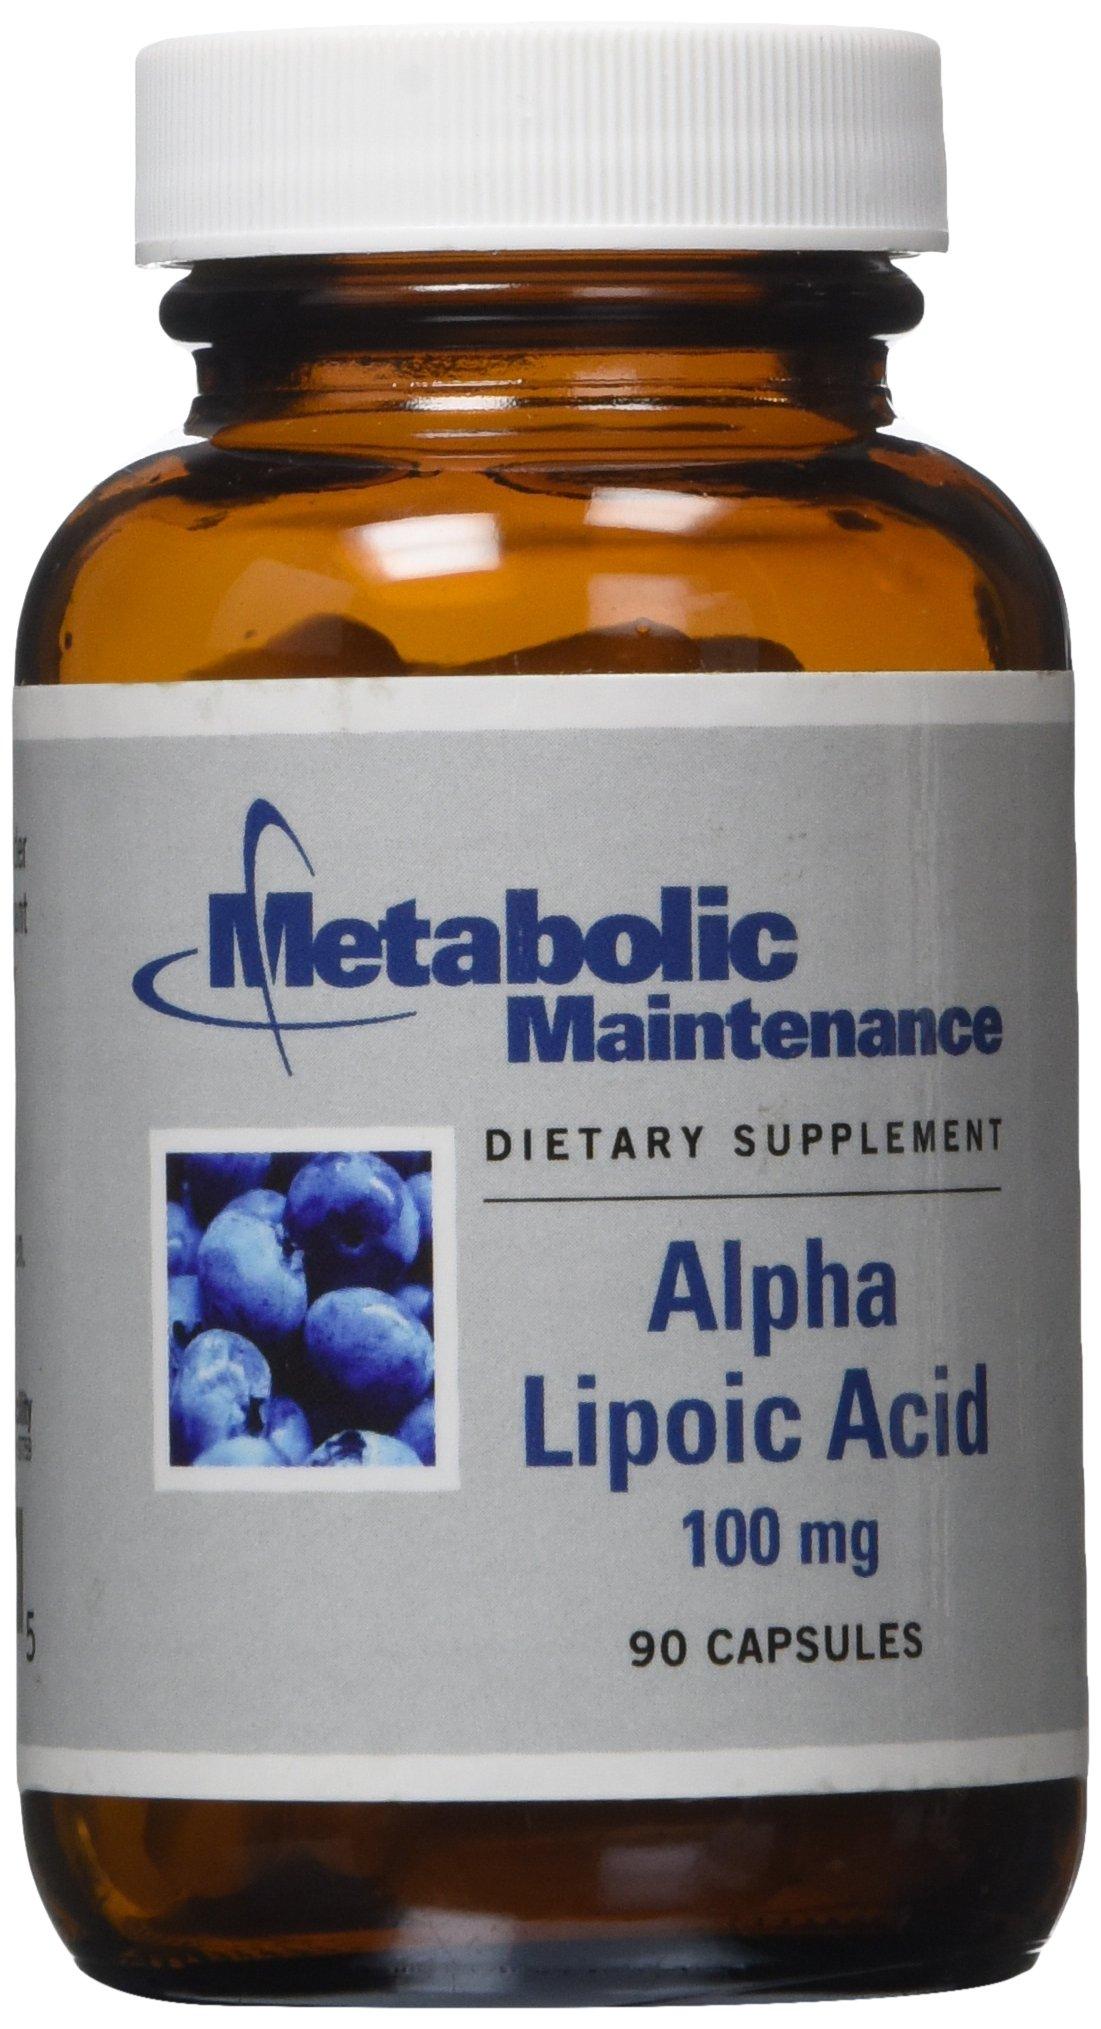 Metabolic Maintenance - Alpha Lipoic Acid - 100 mg, Antioxidant, 90 Capsules